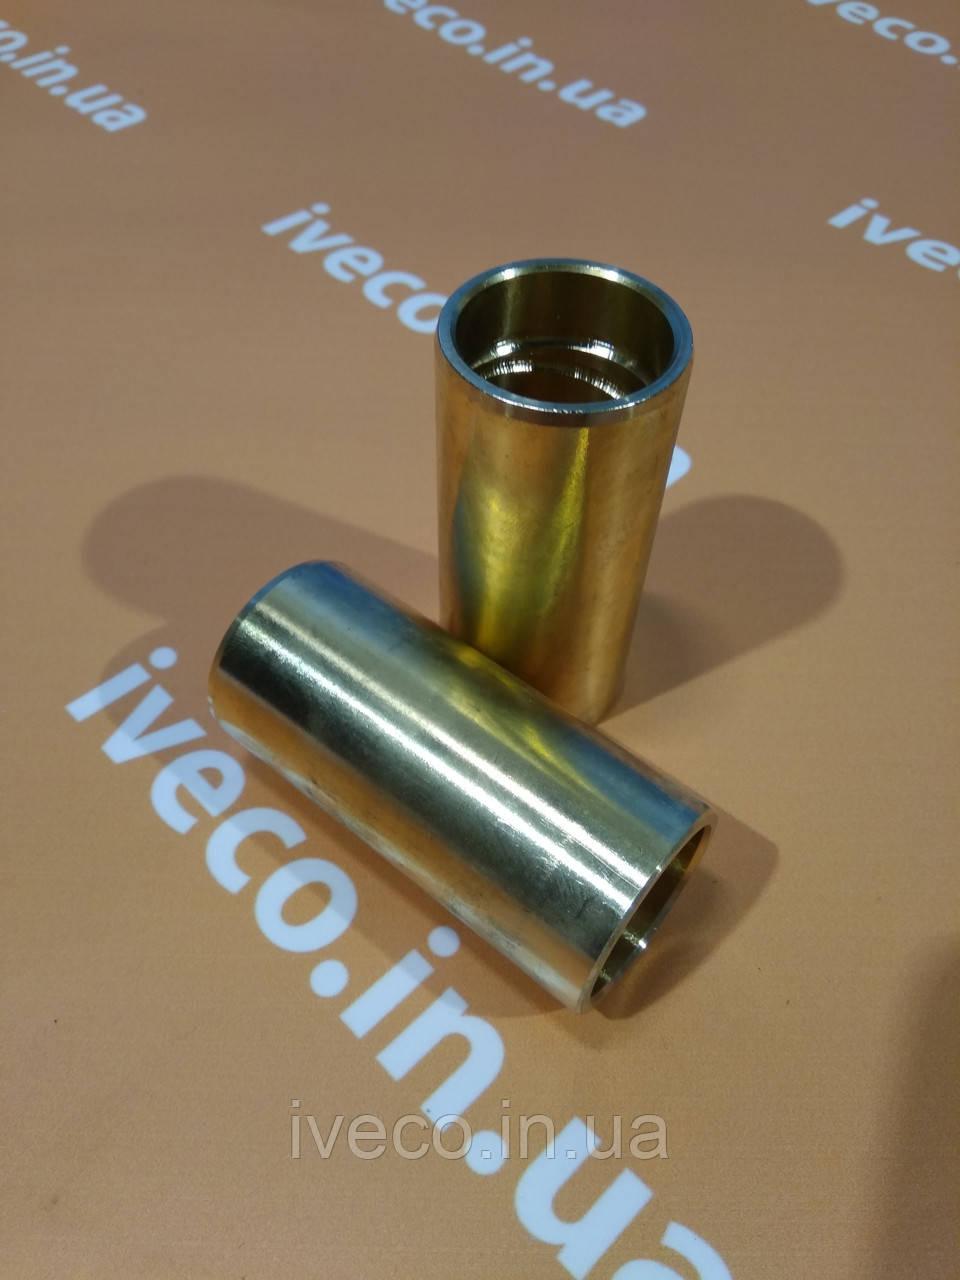 Втулка пальца ушка рессоры бронзовая MAN 81413040041, 30x36x77.5